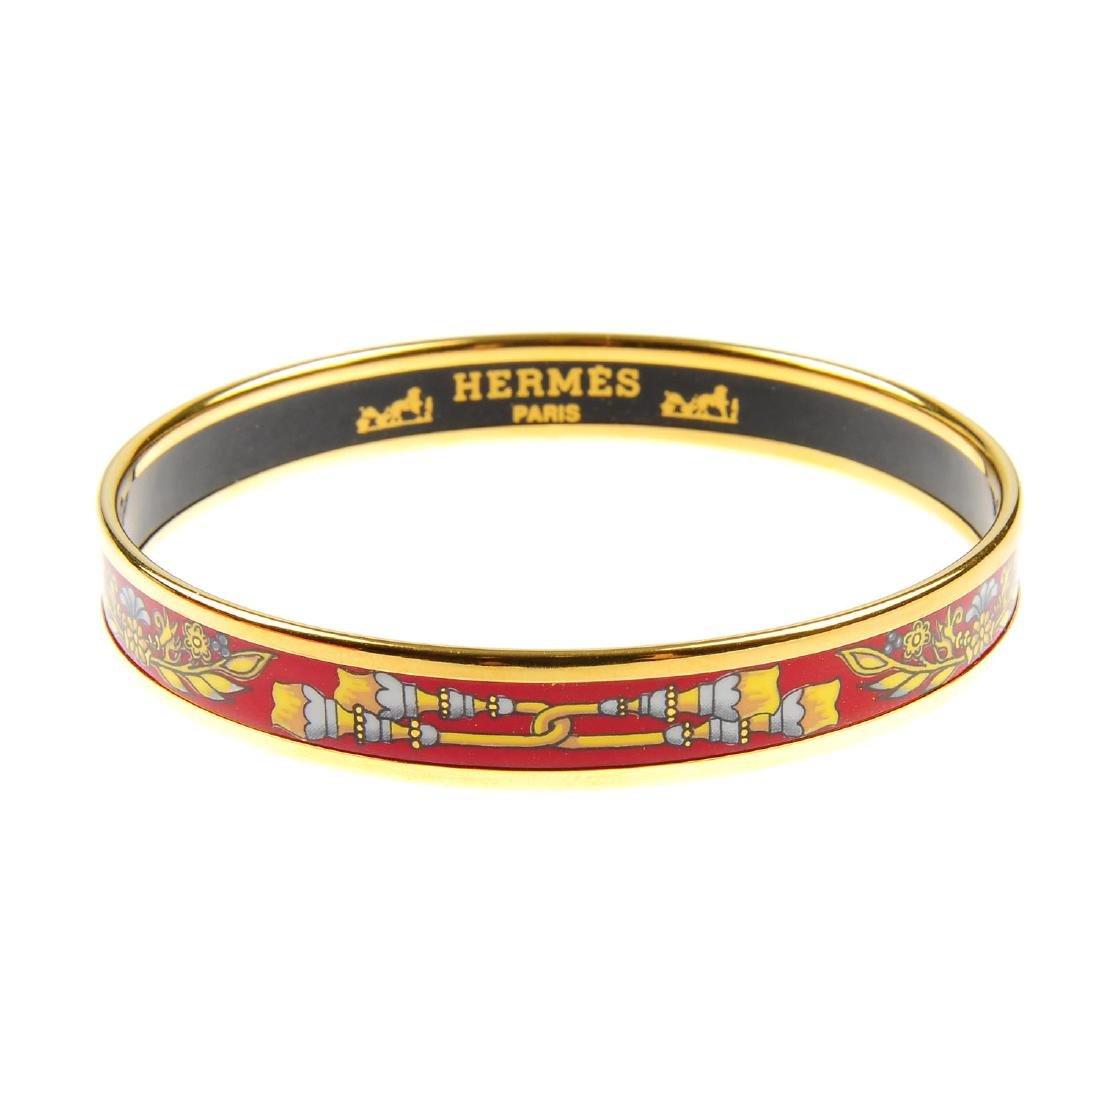 HERMÈS - an enamel bangle. With gold-tone edge, the